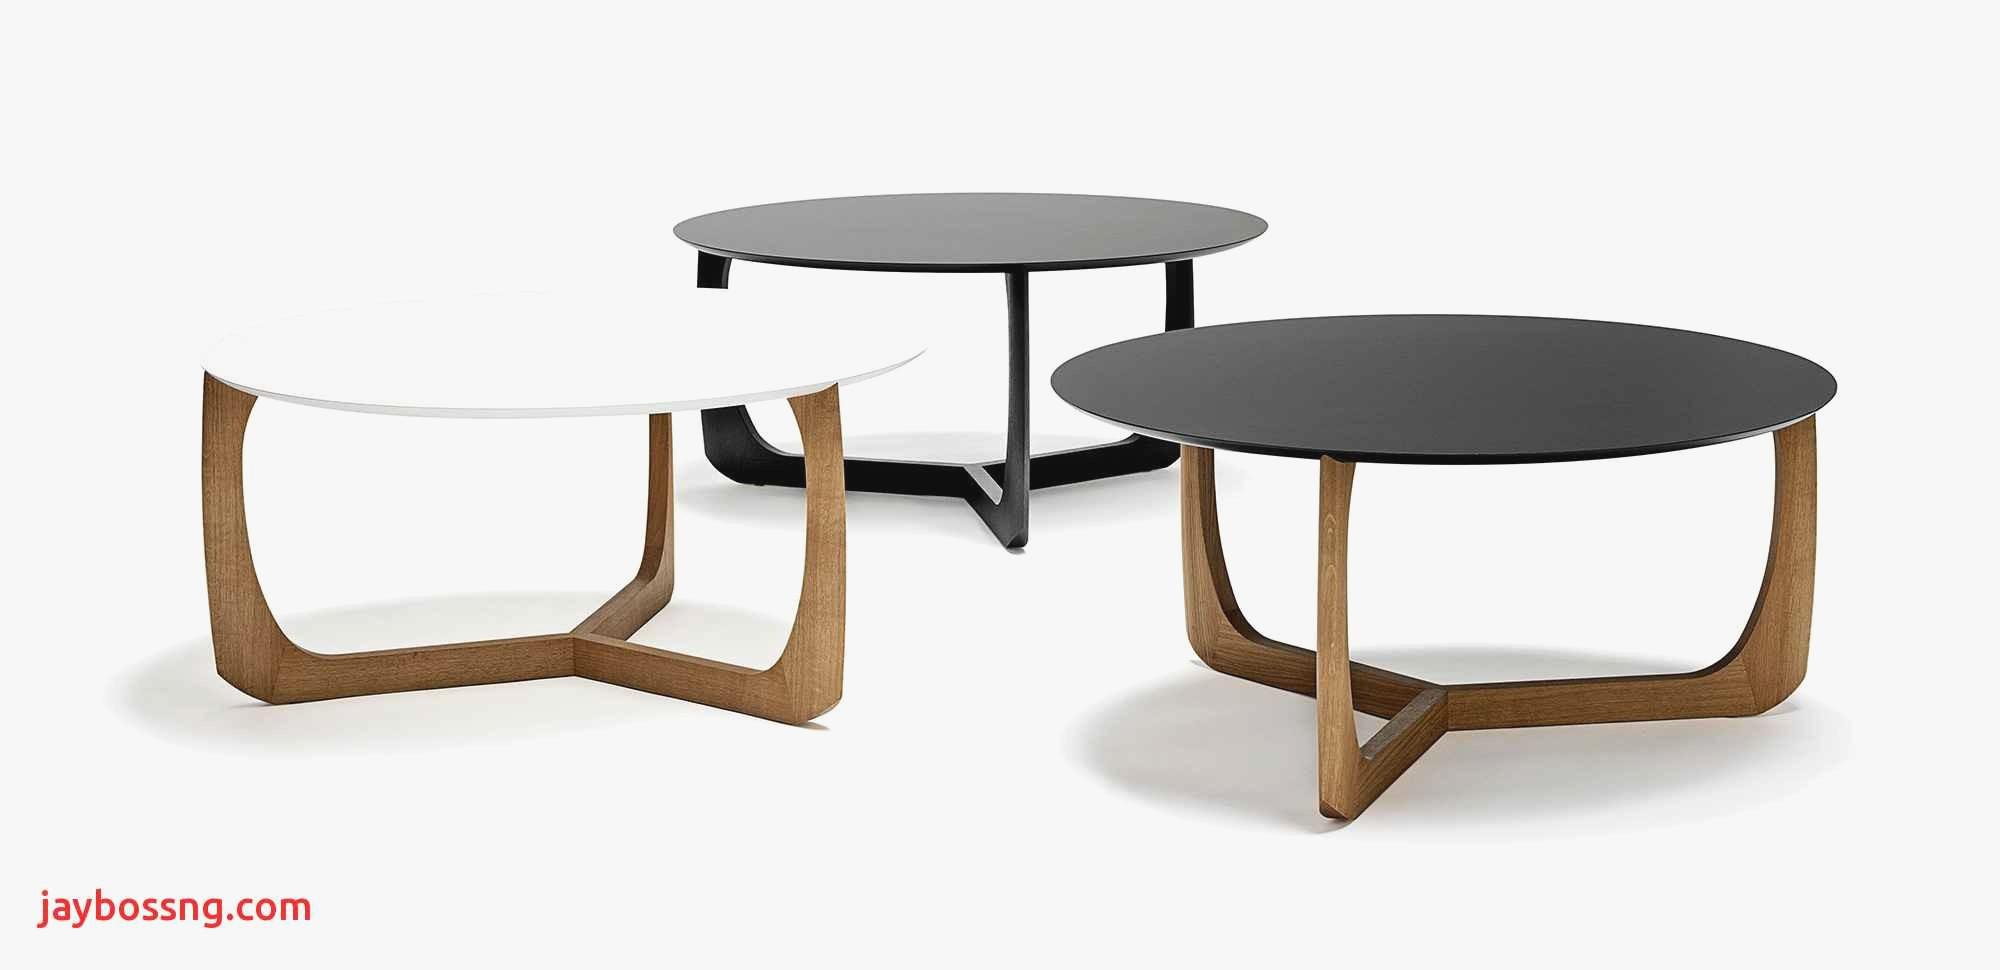 Table basse scandinave jardin